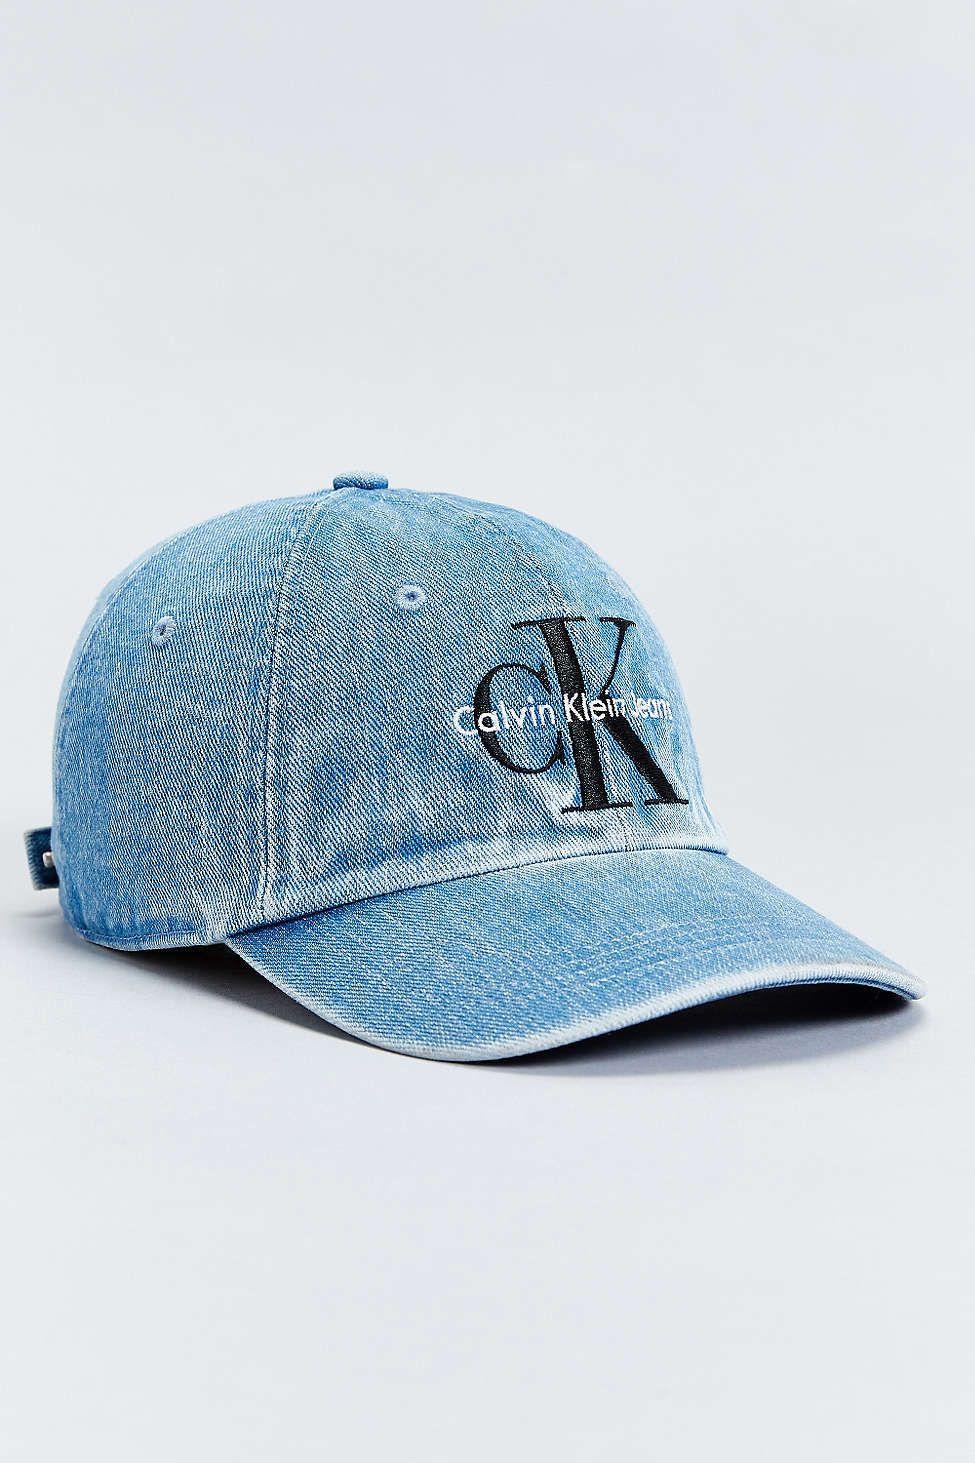 0b41d8c448c Calvin Klein Baseball Hat